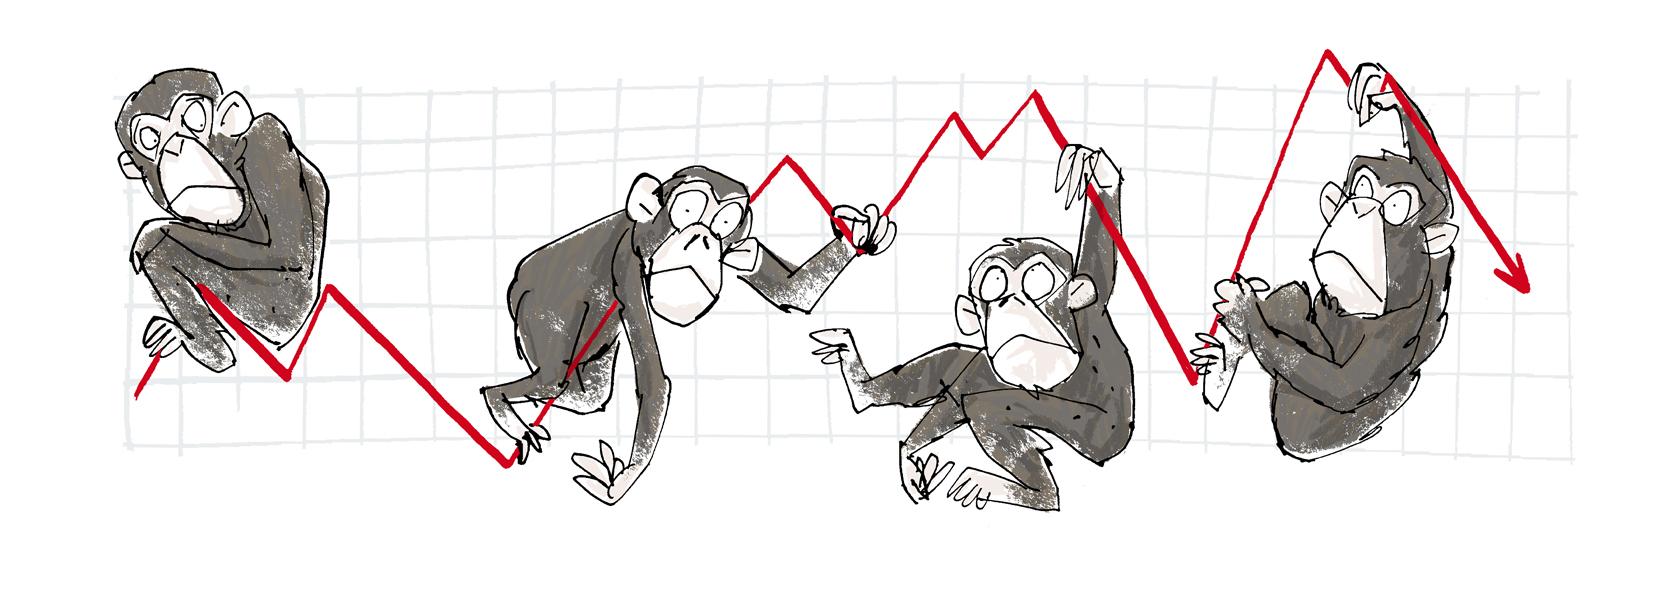 Stupid Investment Decisons